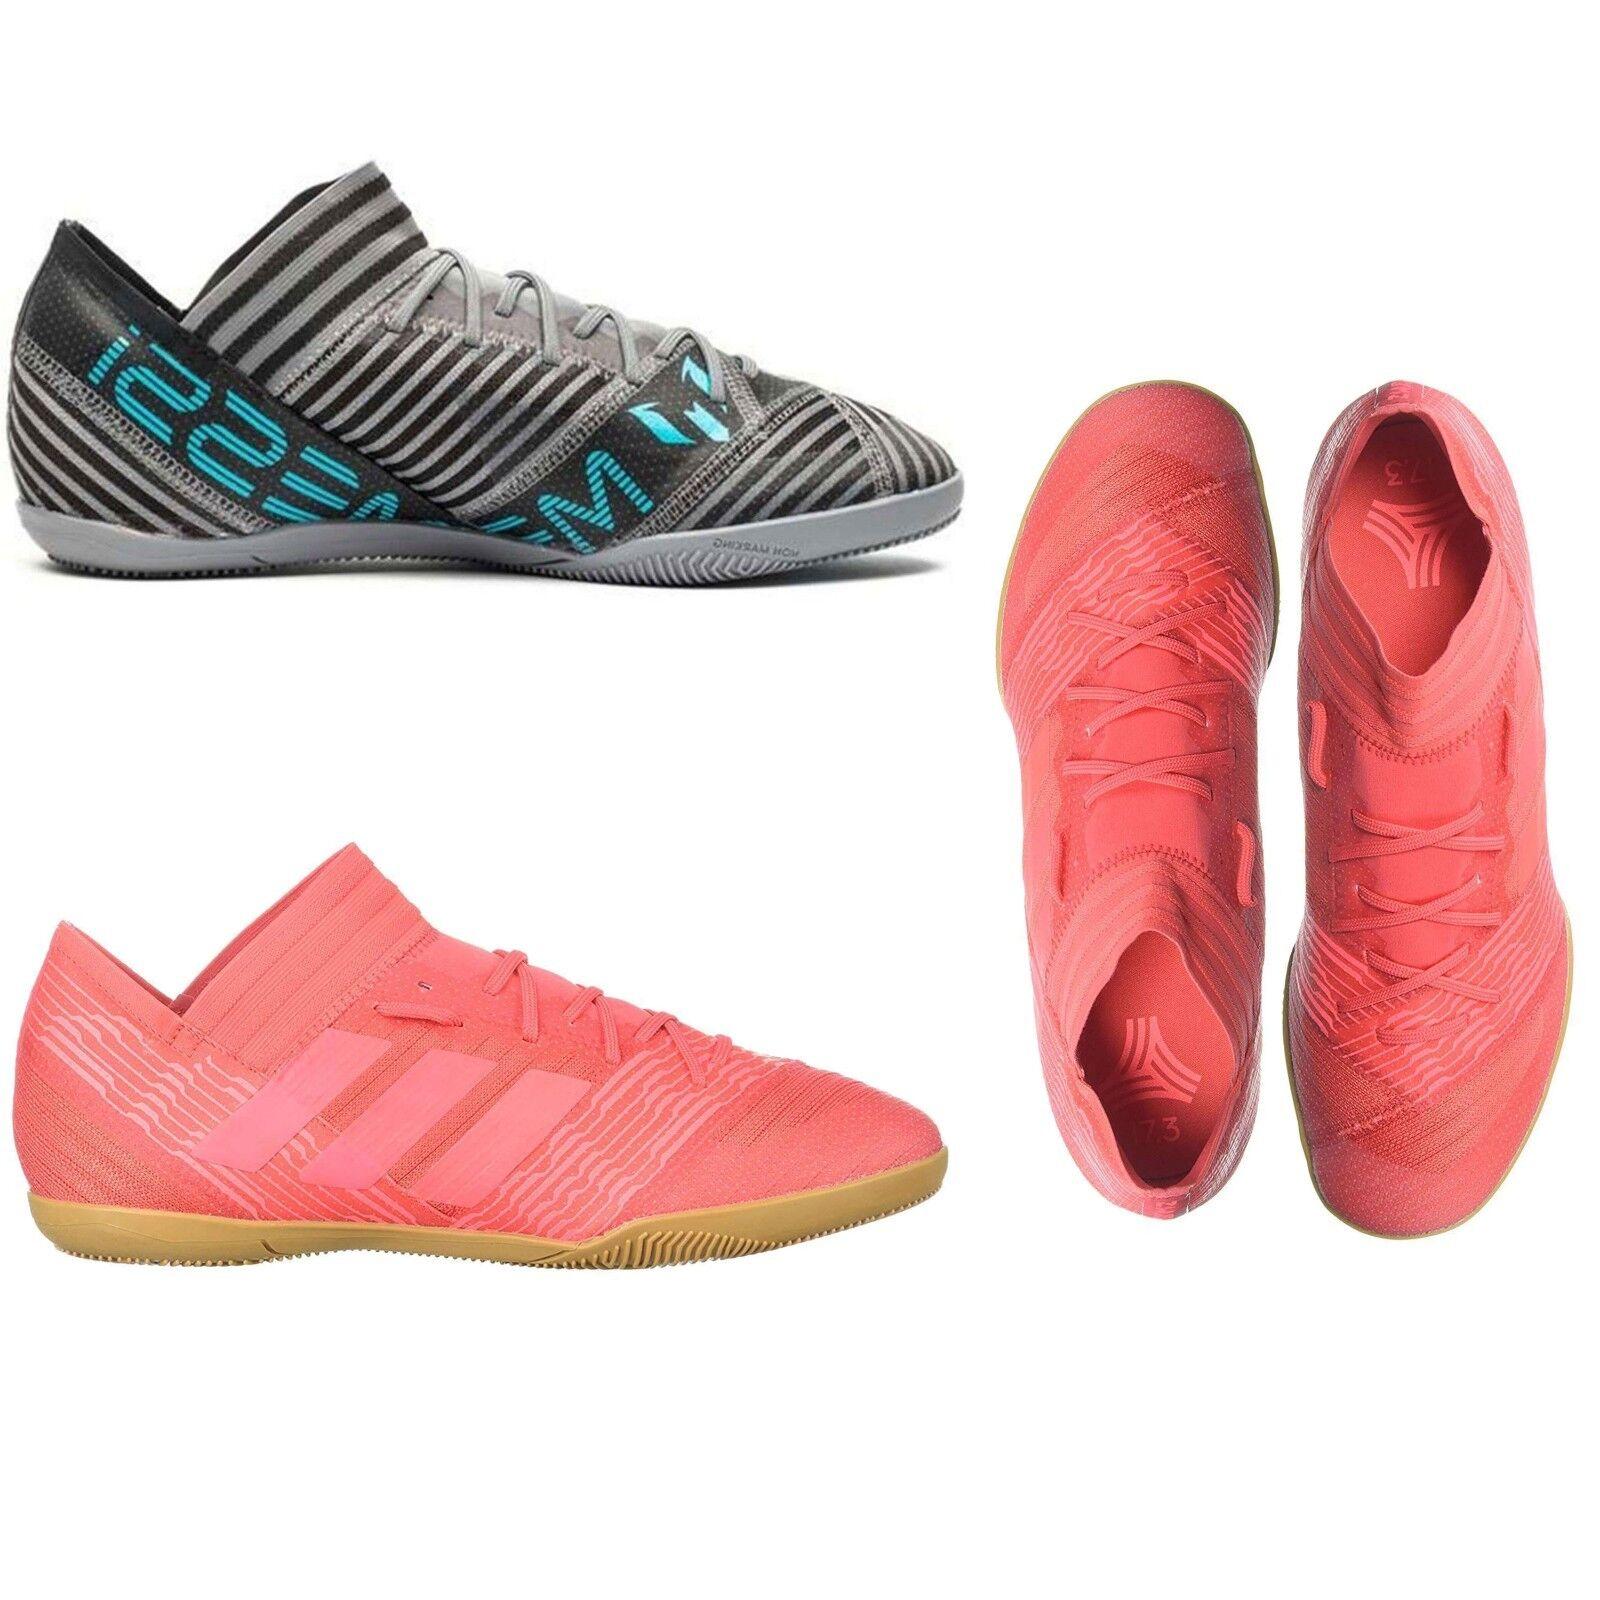 adidas männer nemeziz - messi tango 17,3 indoor - nemeziz stollen fußballschuhe turnschuhe cp9106 703c17